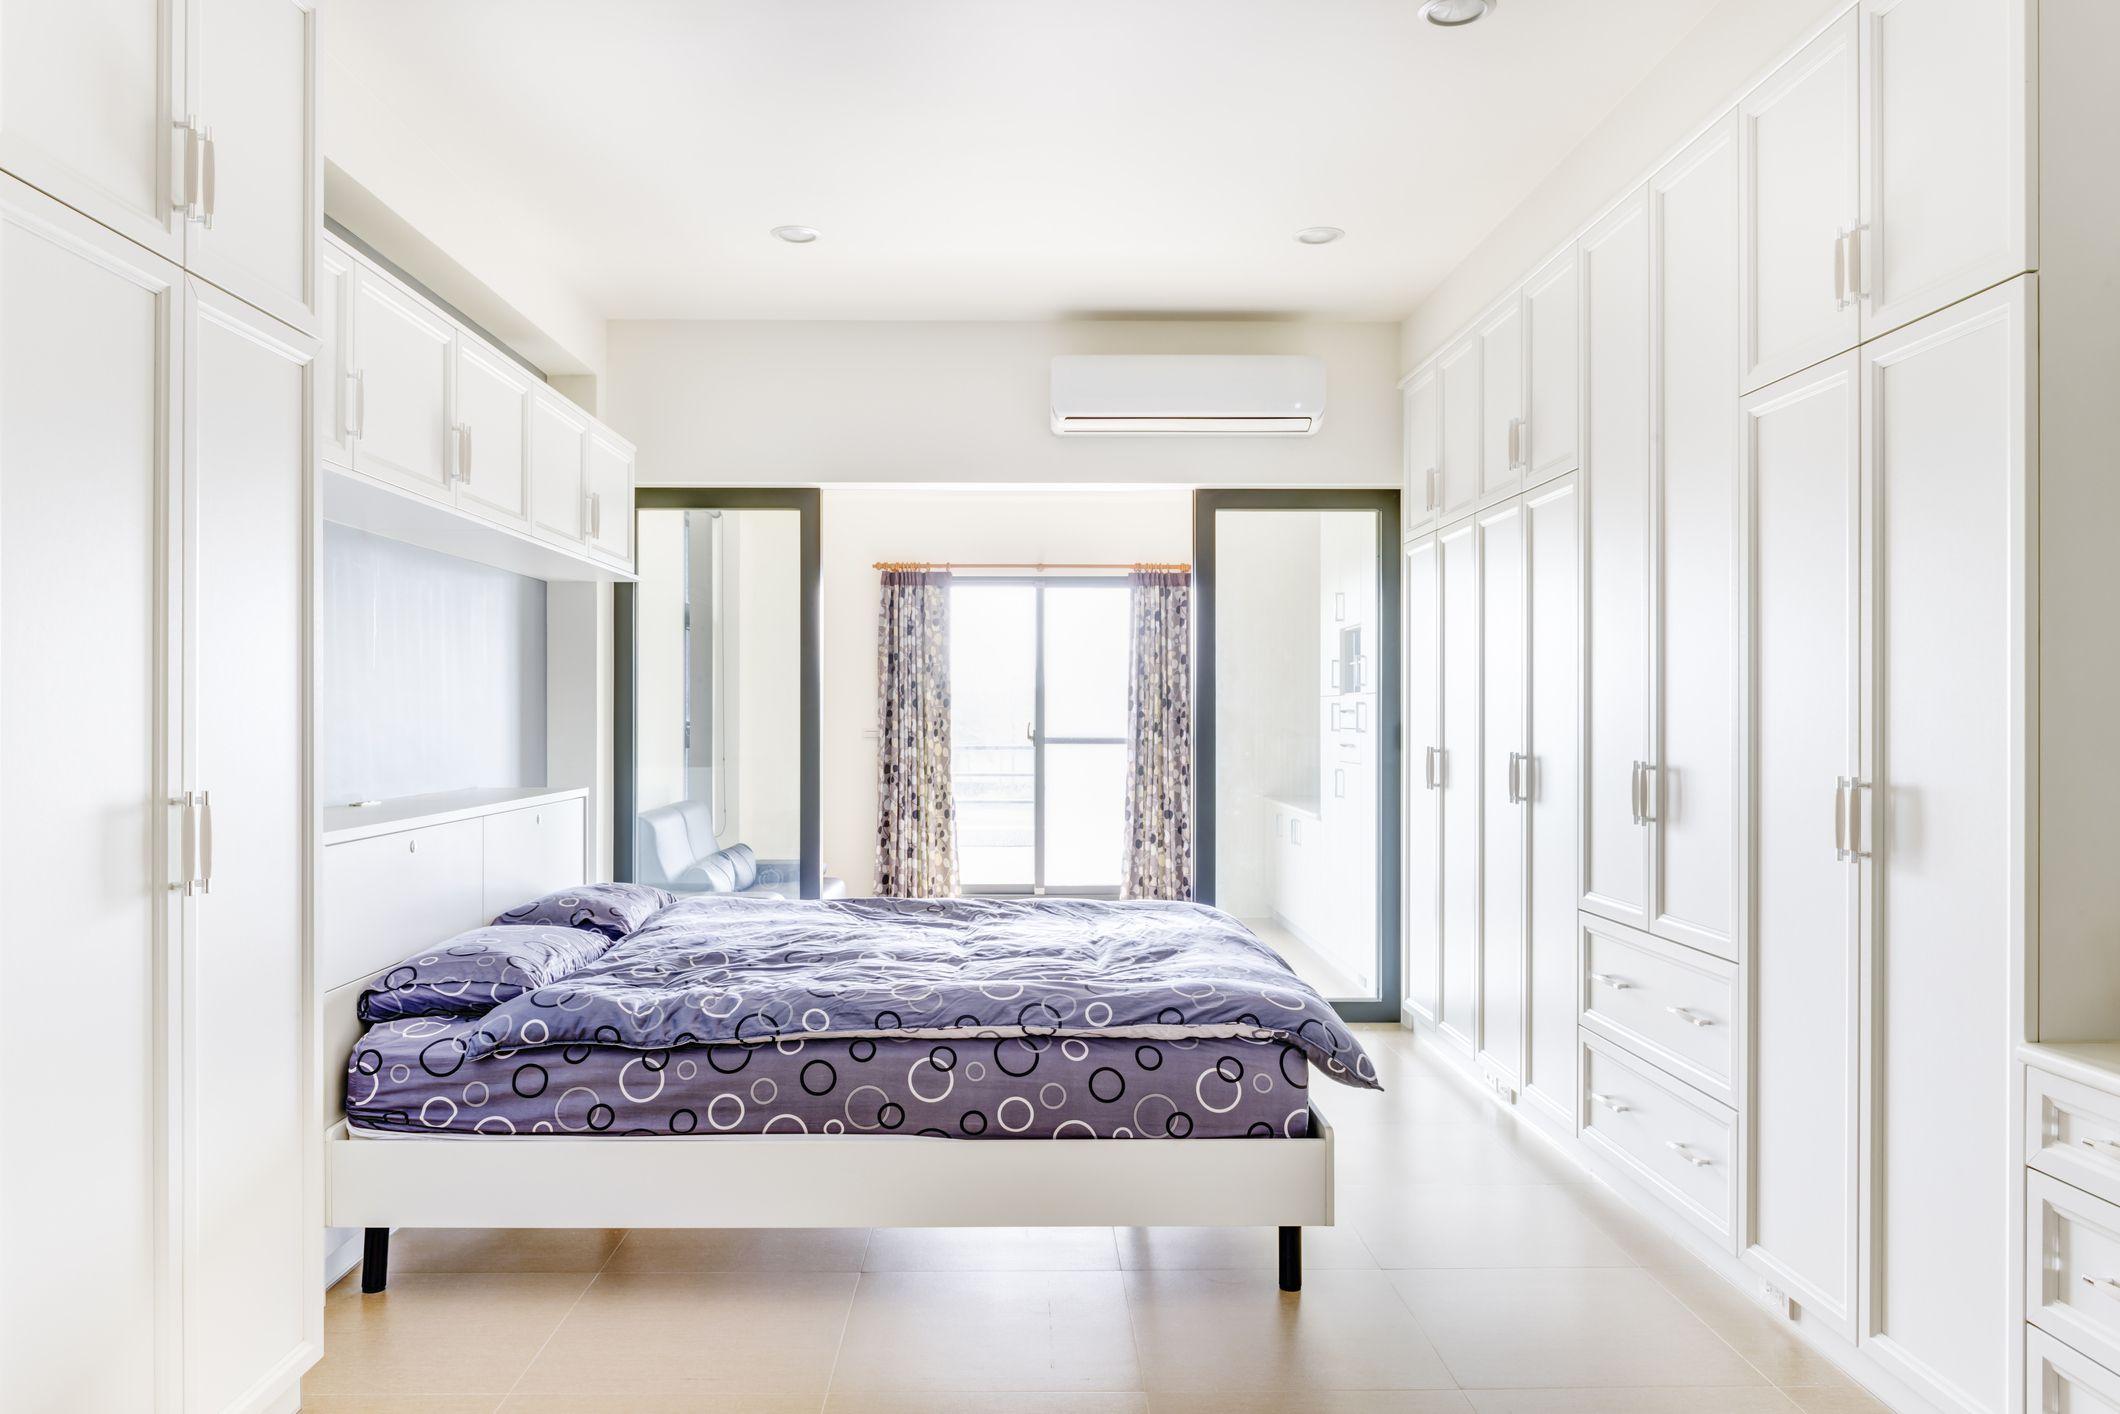 Vinyl Bedroom Flooring Materials And Options